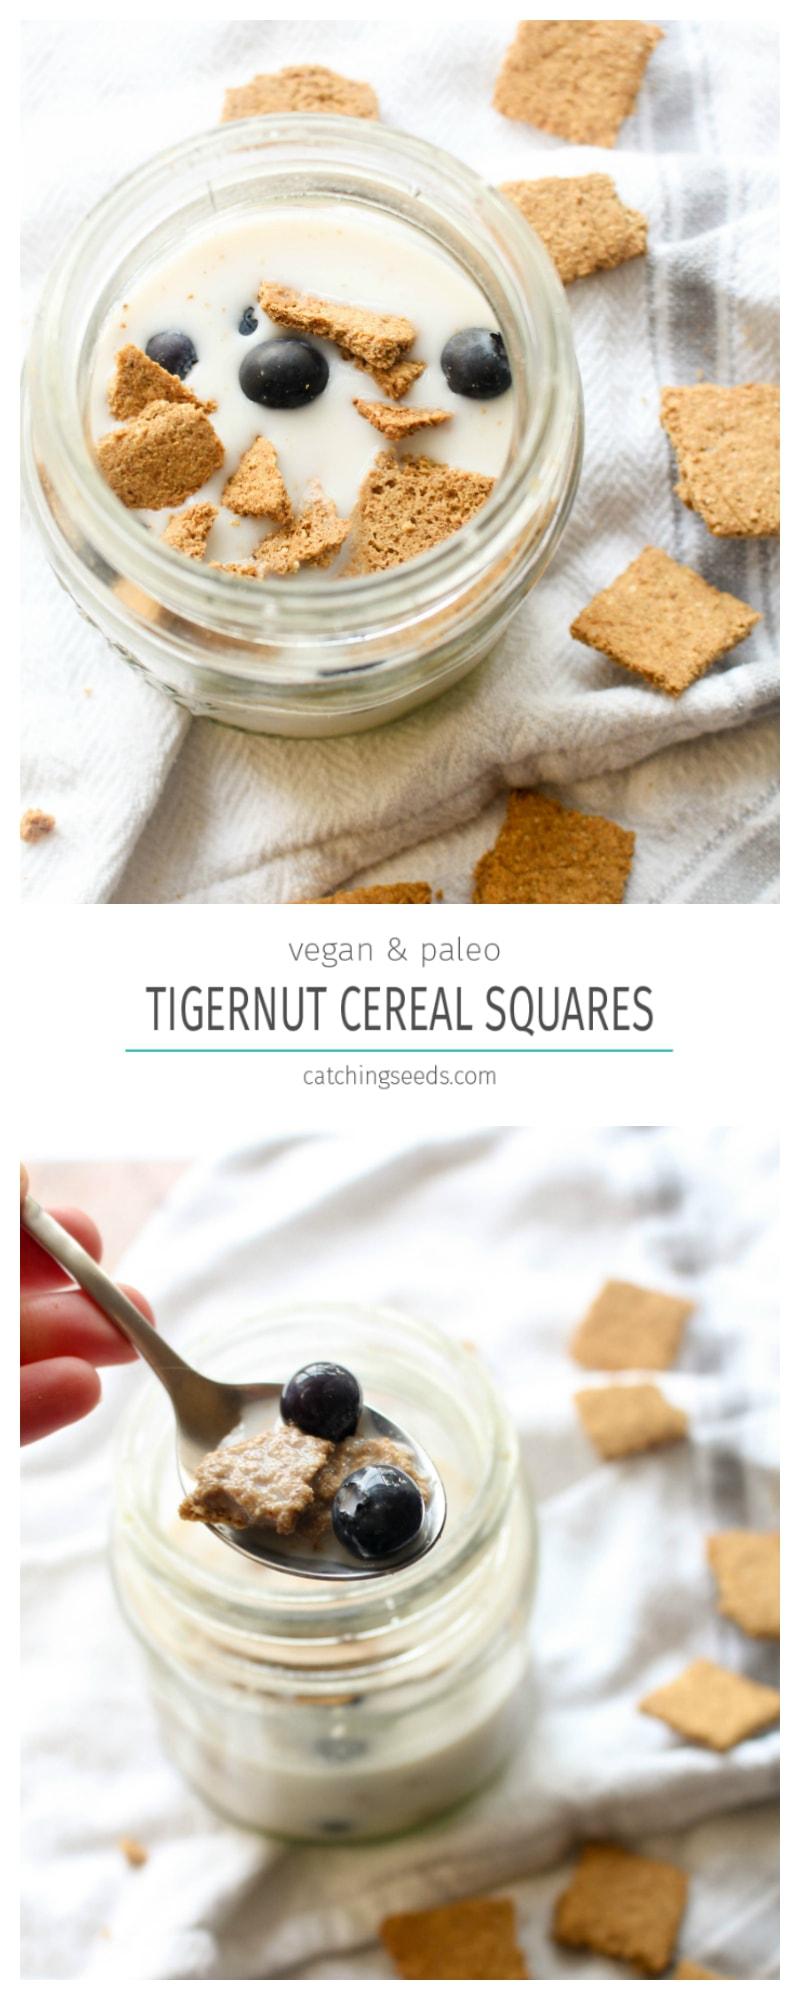 Tigernut Cereal Squares